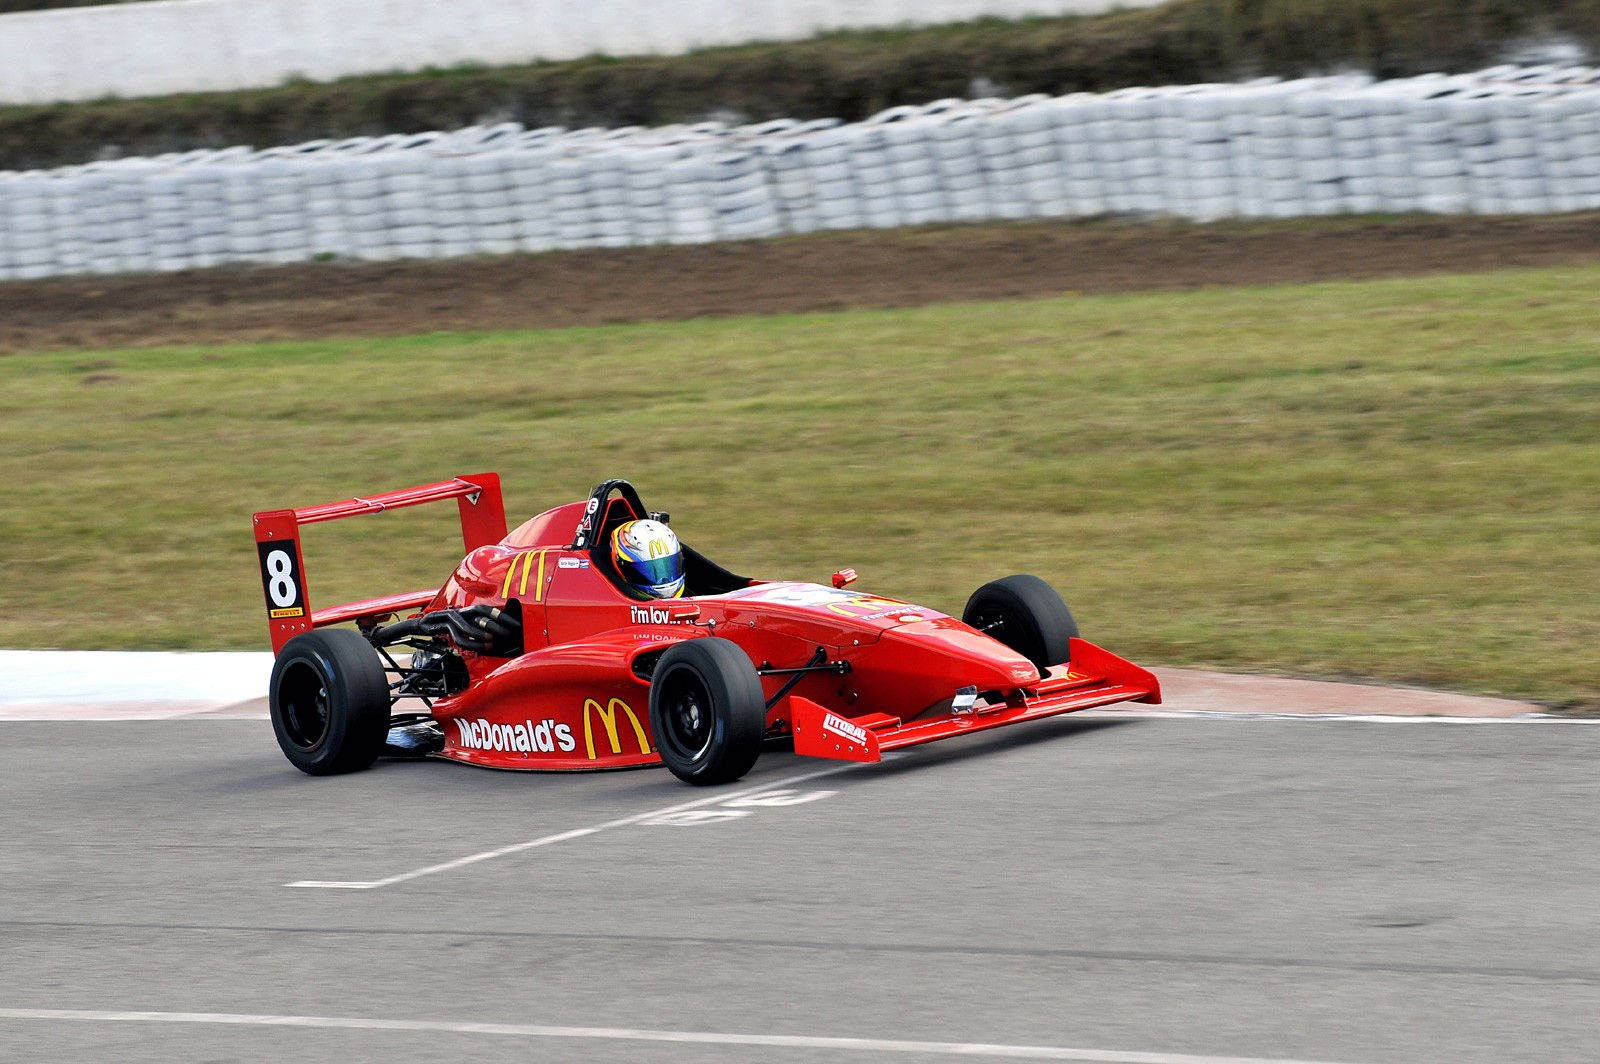 Fórmula Renault 2.0: Moggia x 2